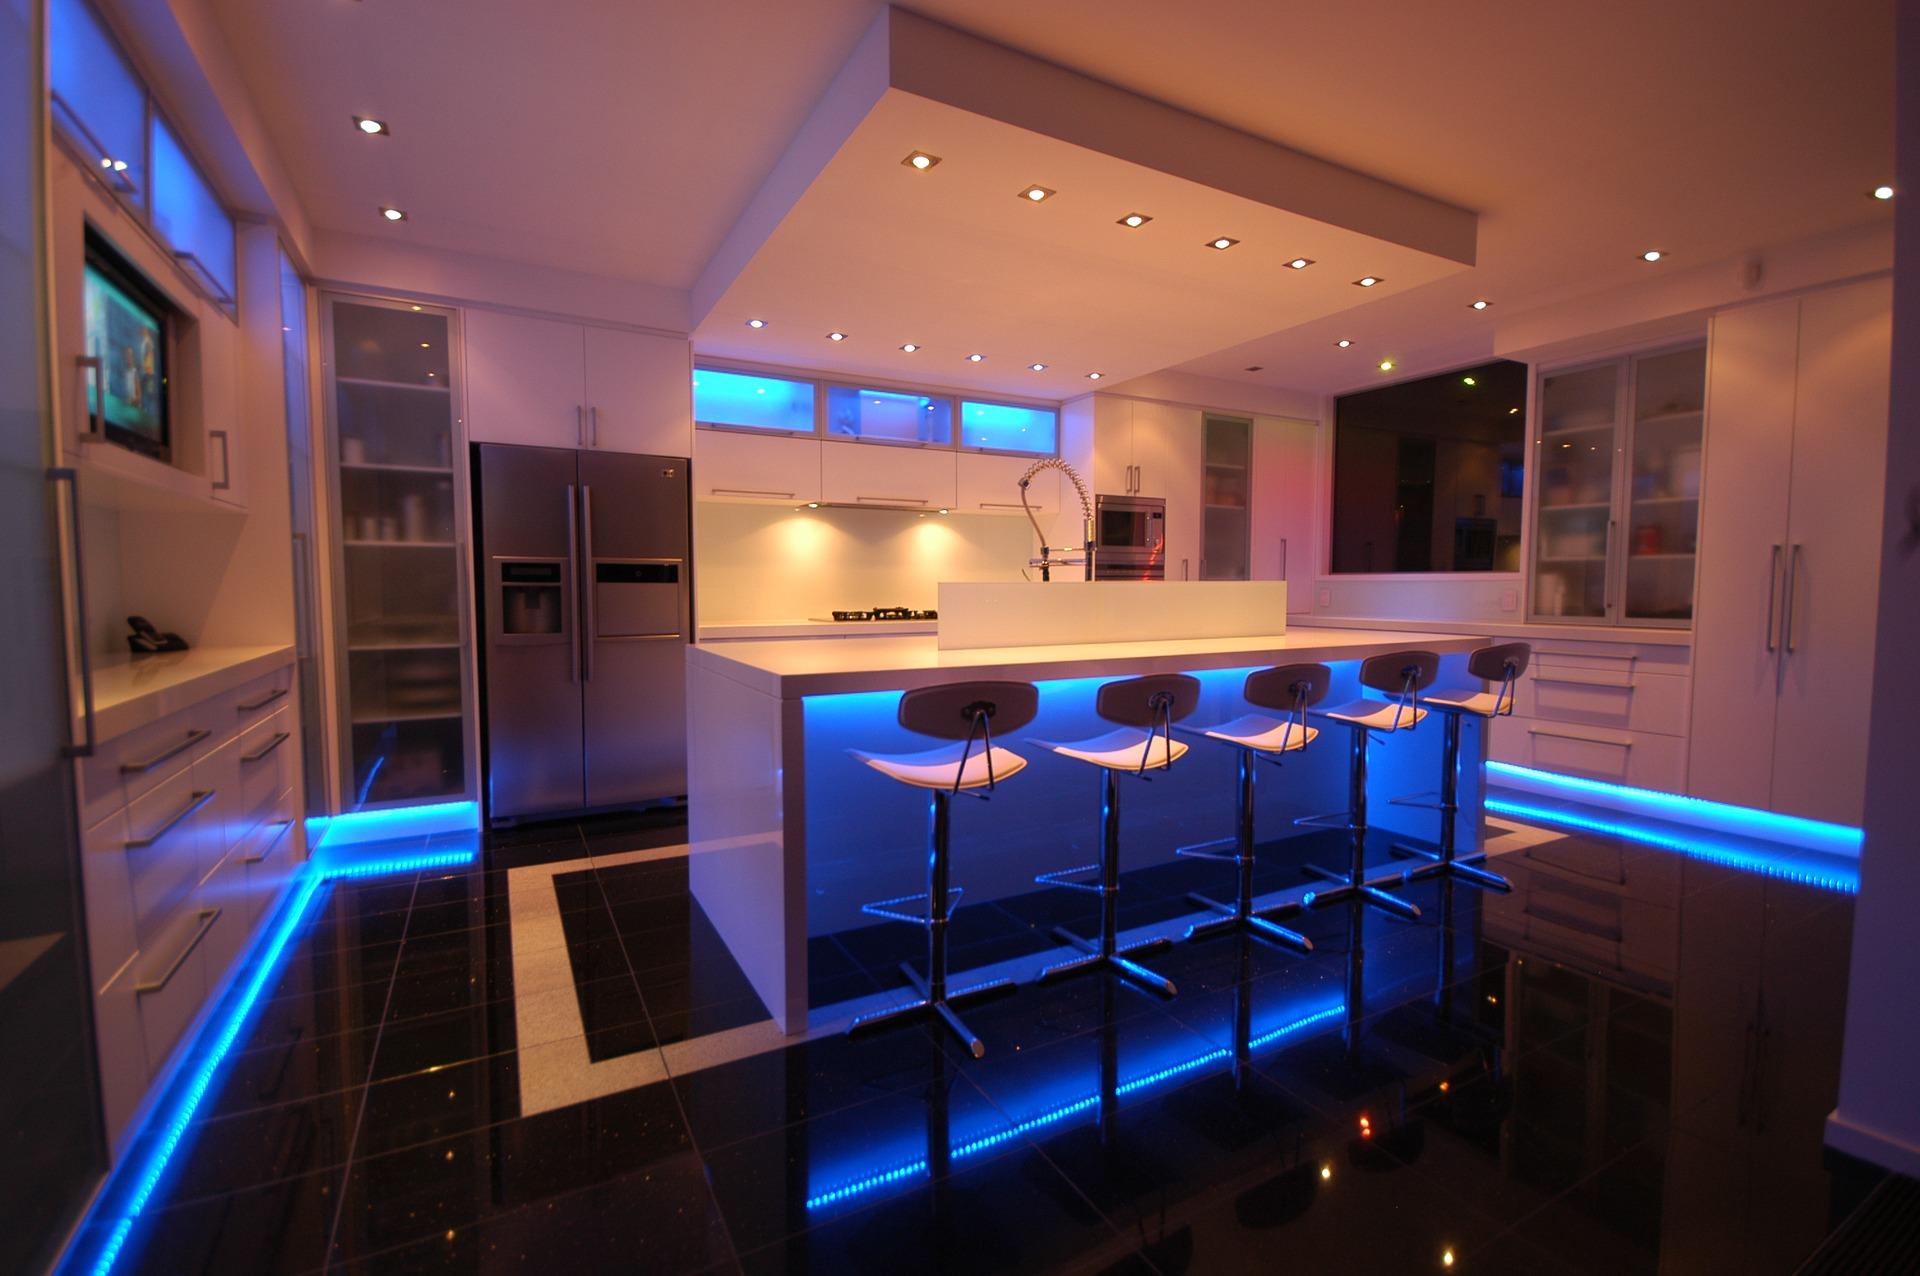 8 best wood styles to rock kitchen cabinets & worktops